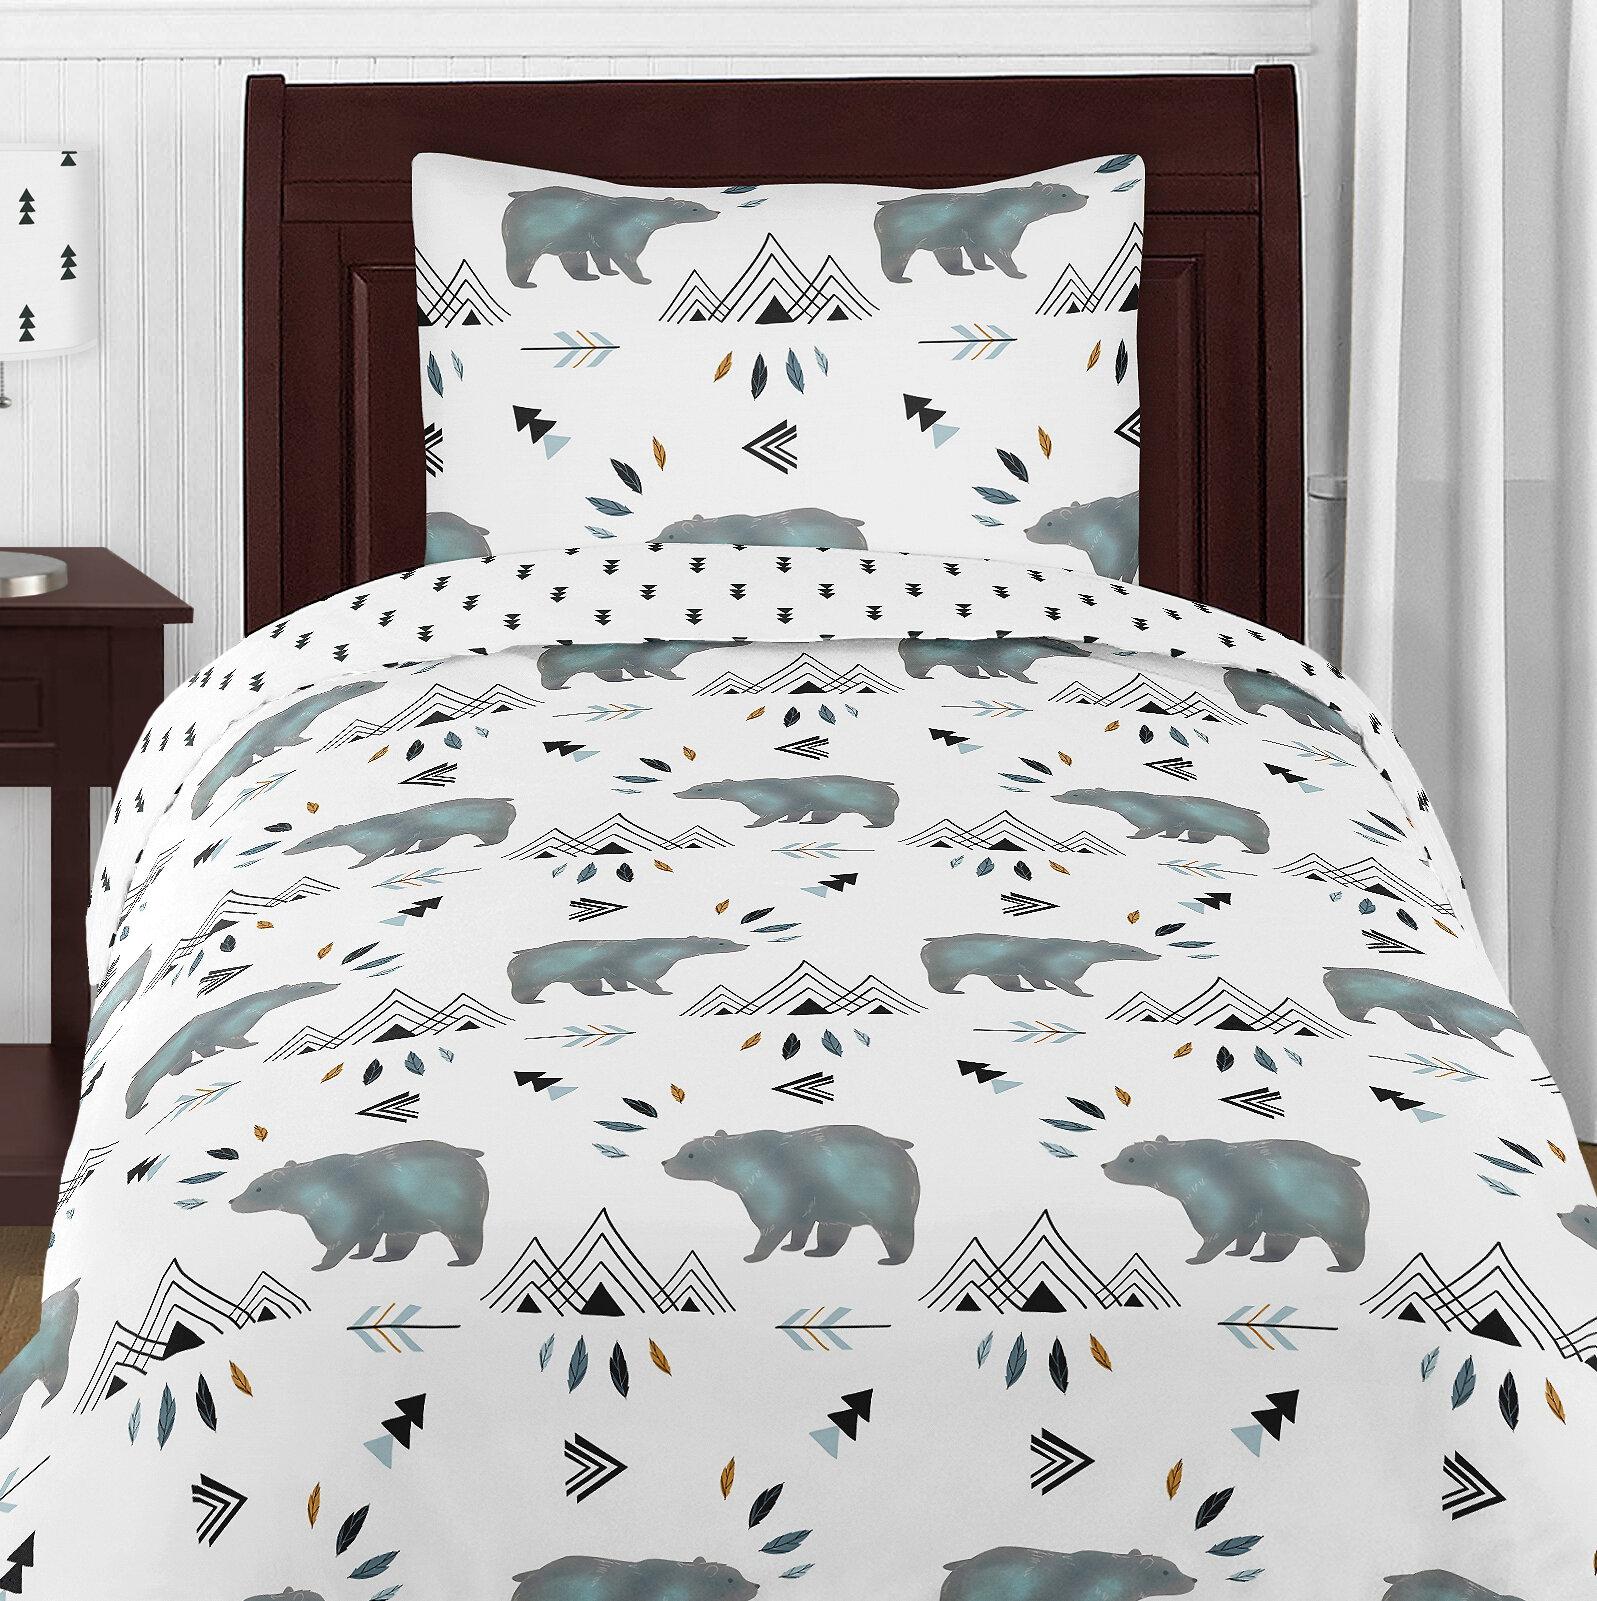 Sweet Jojo Designs Bear Mountain Comforter Set Reviews Wayfair